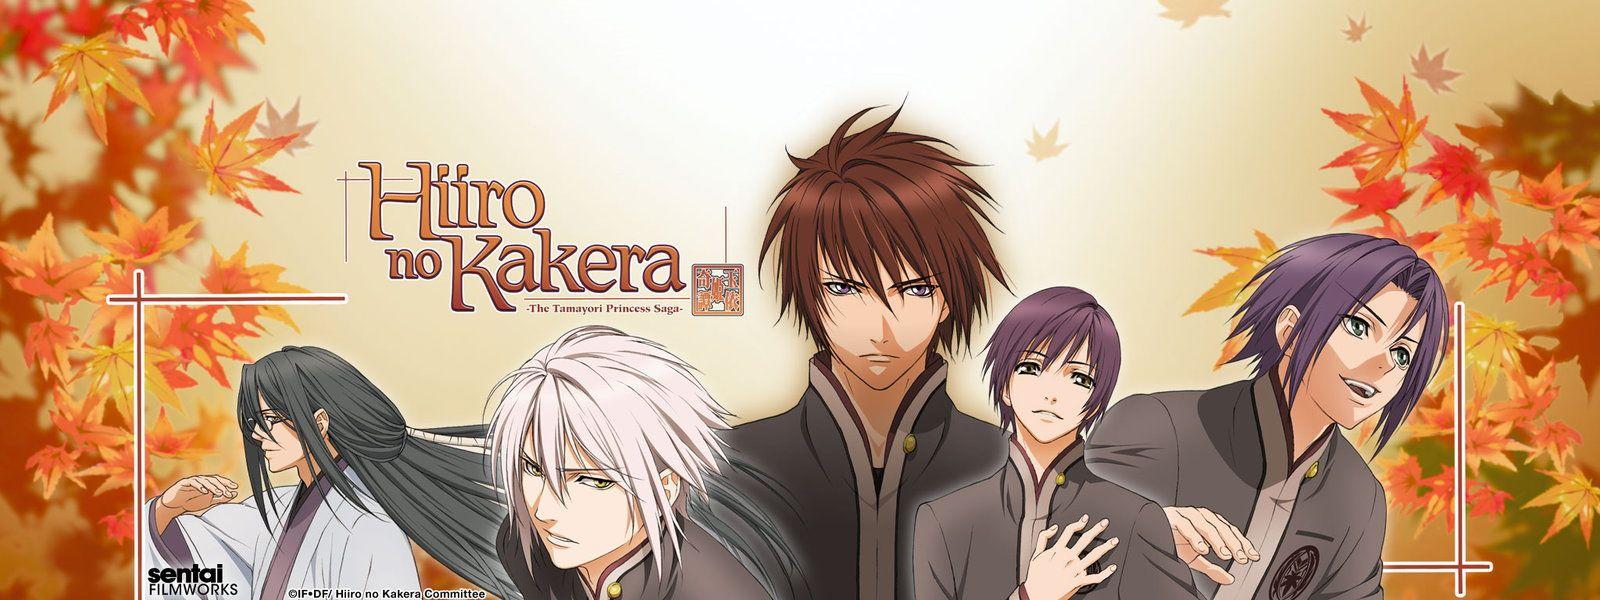 Pin on Anime and Manga+Manhwa!